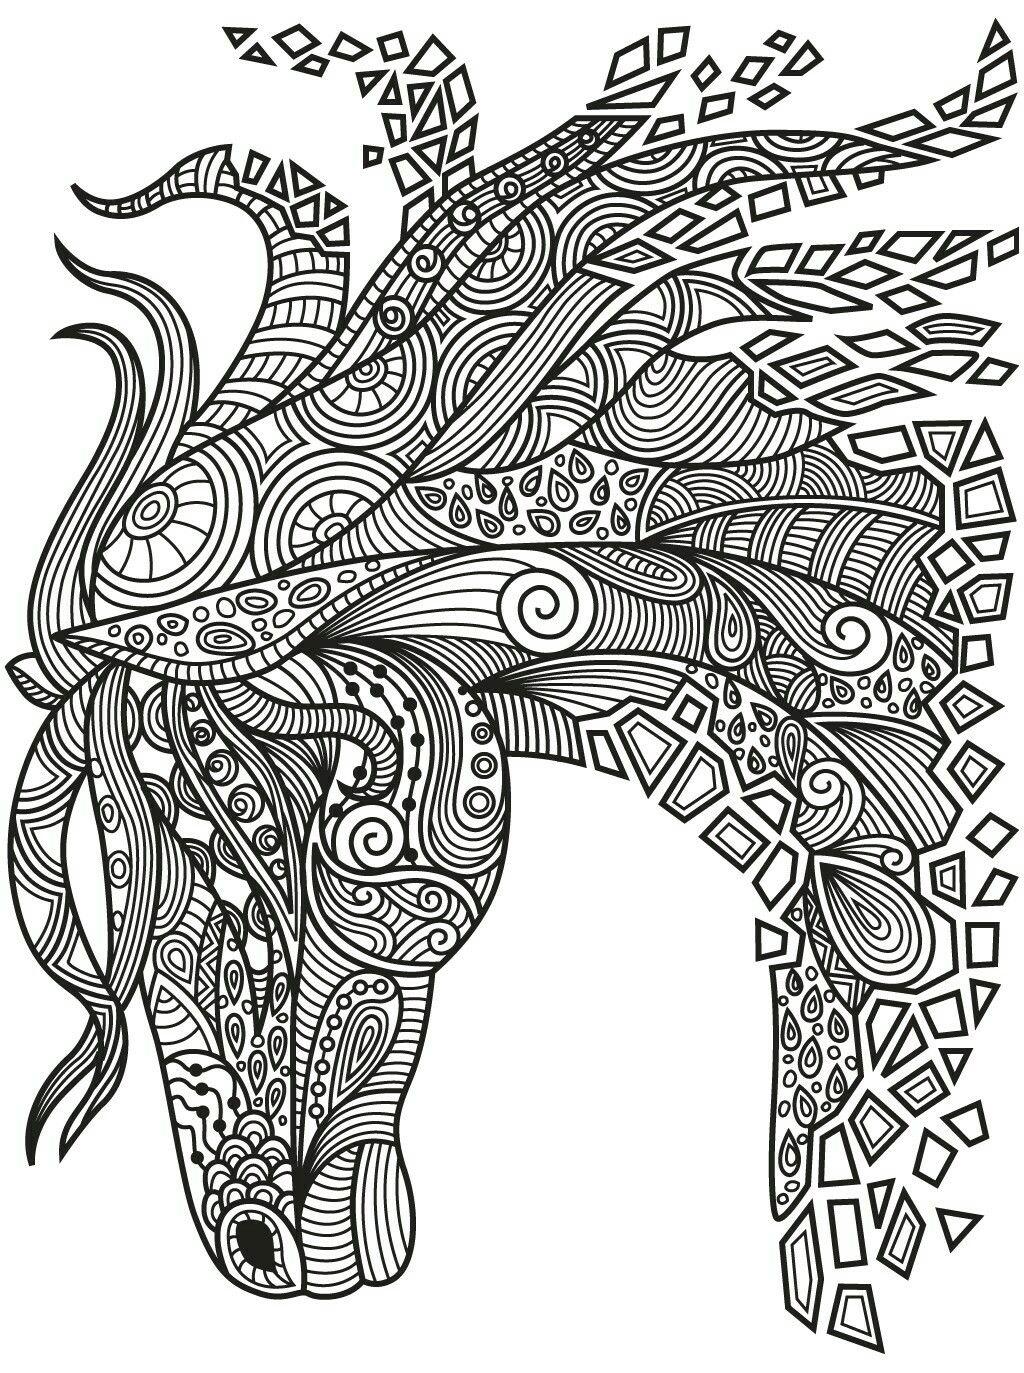 Beautiful Zentangle Horse Colorish Coloring Book App For Adults